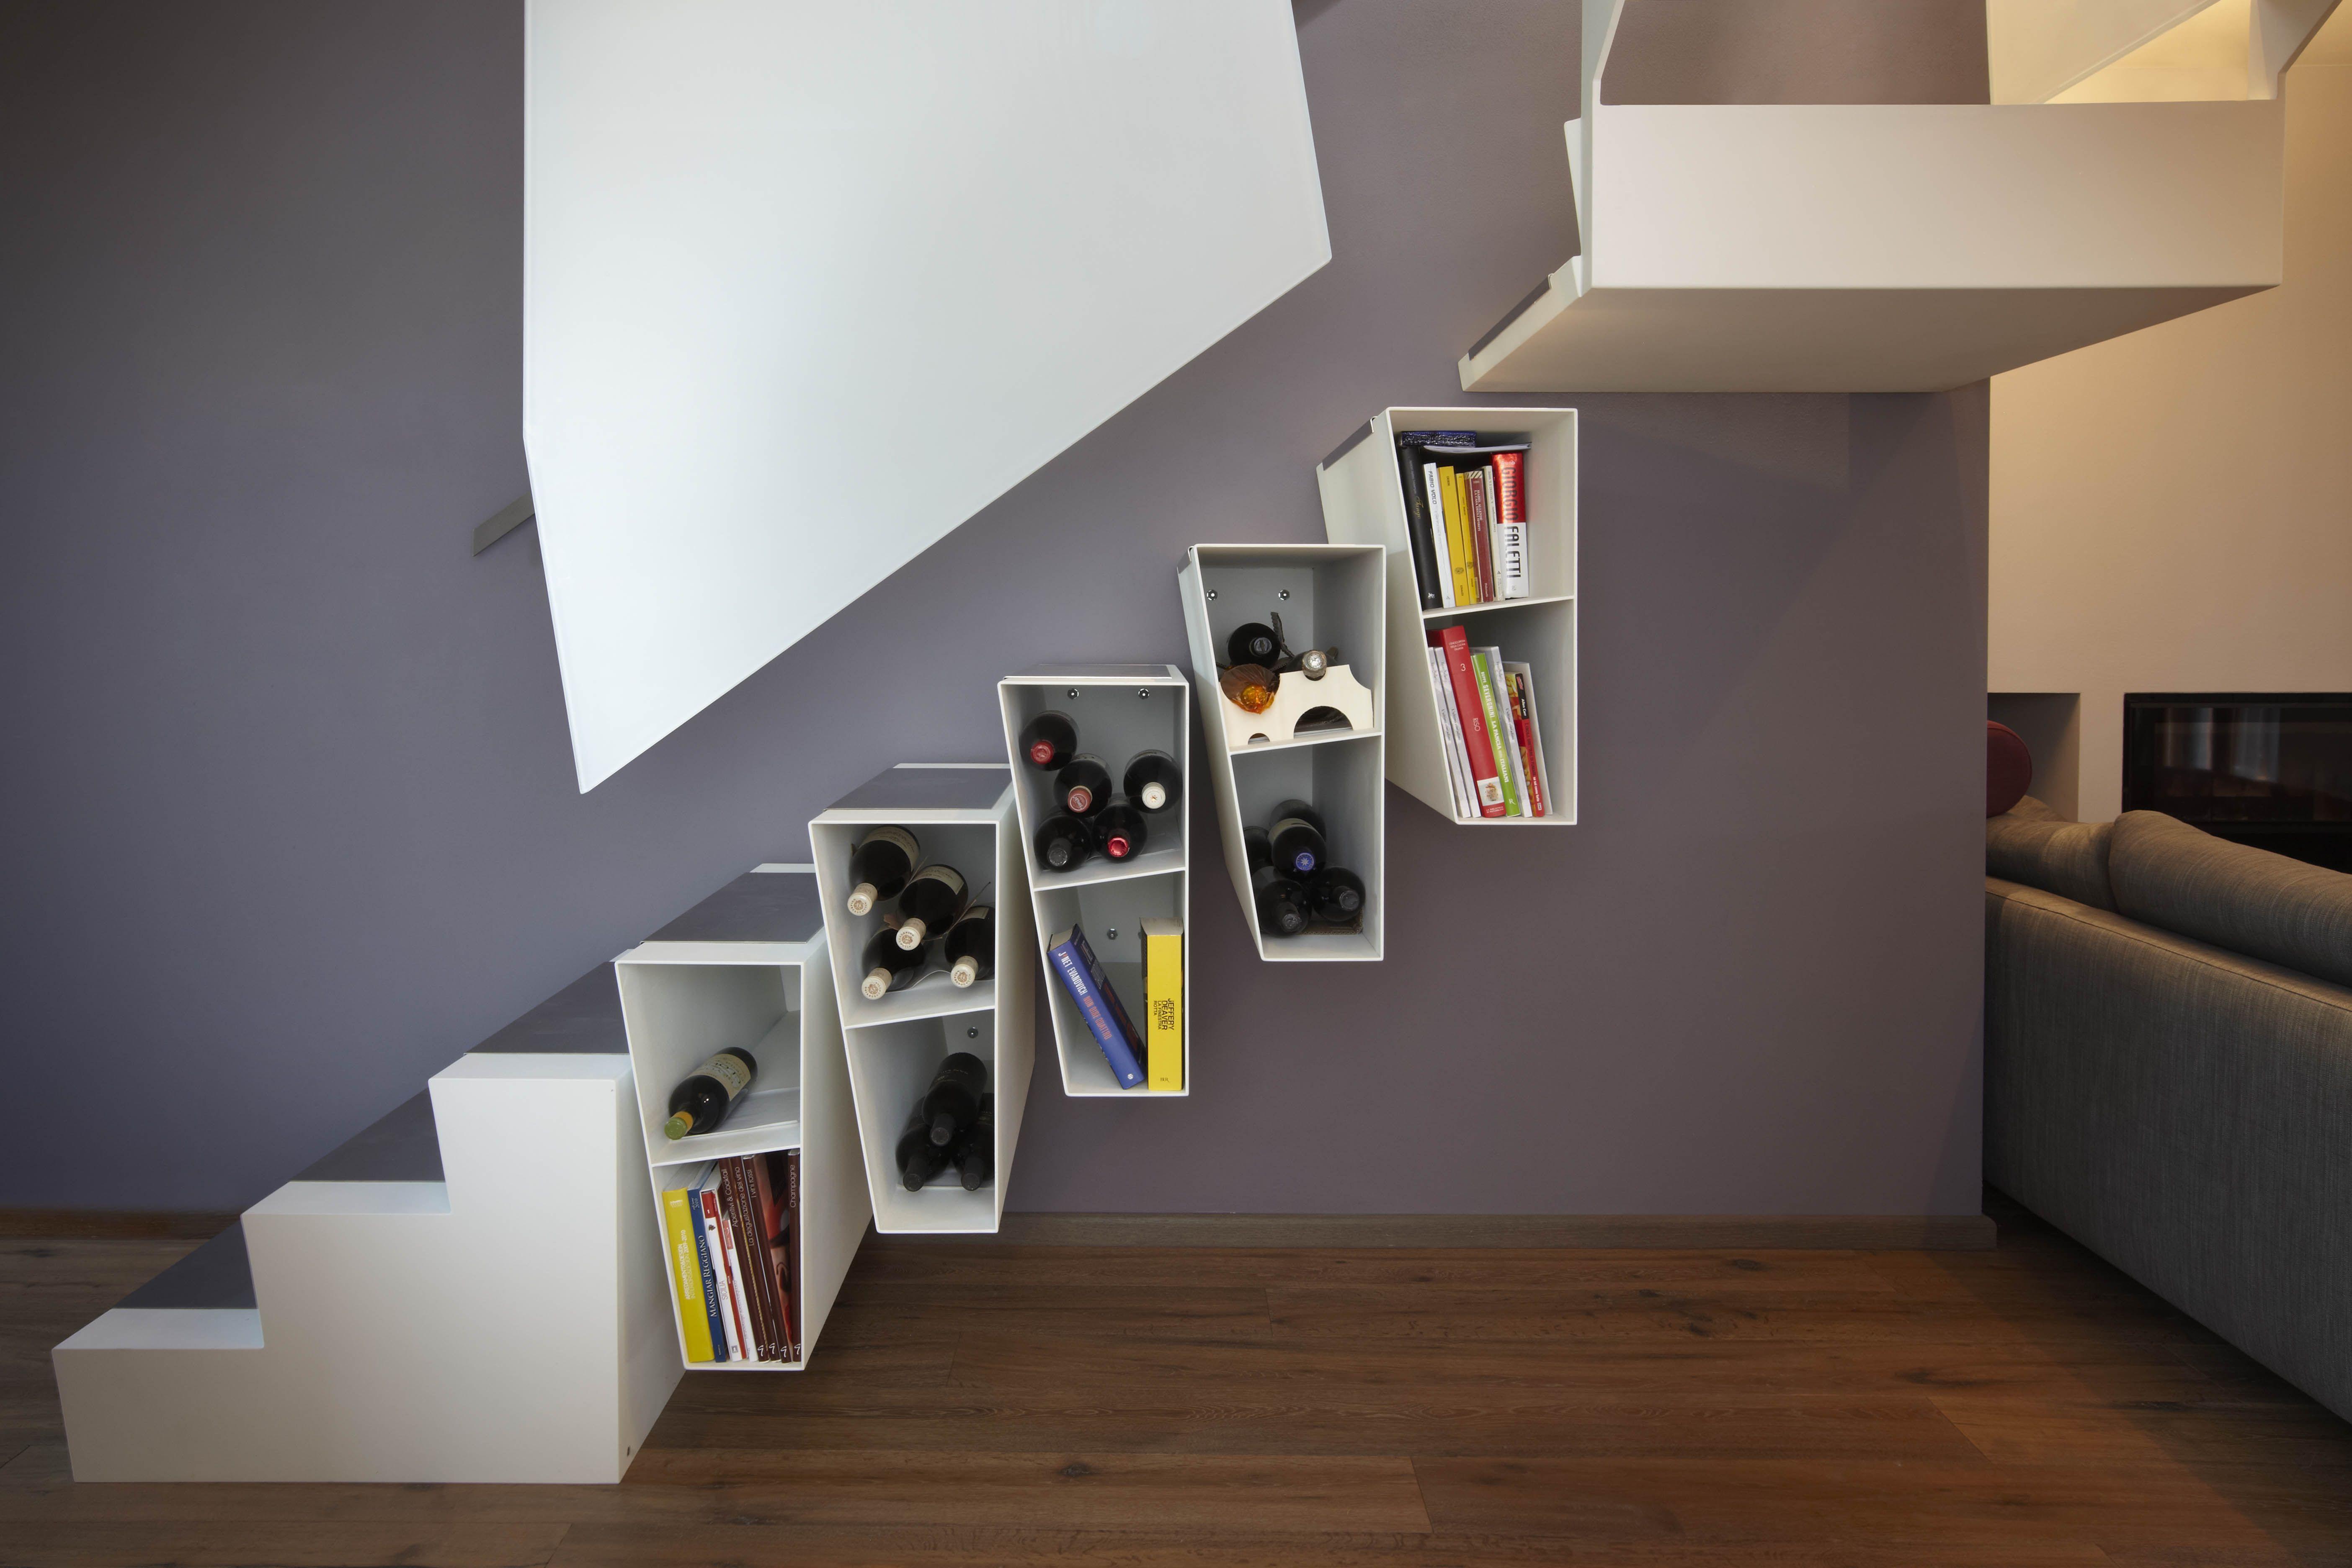 Scala Su Disegno Staircase Design Stairs Design Interior Stairs